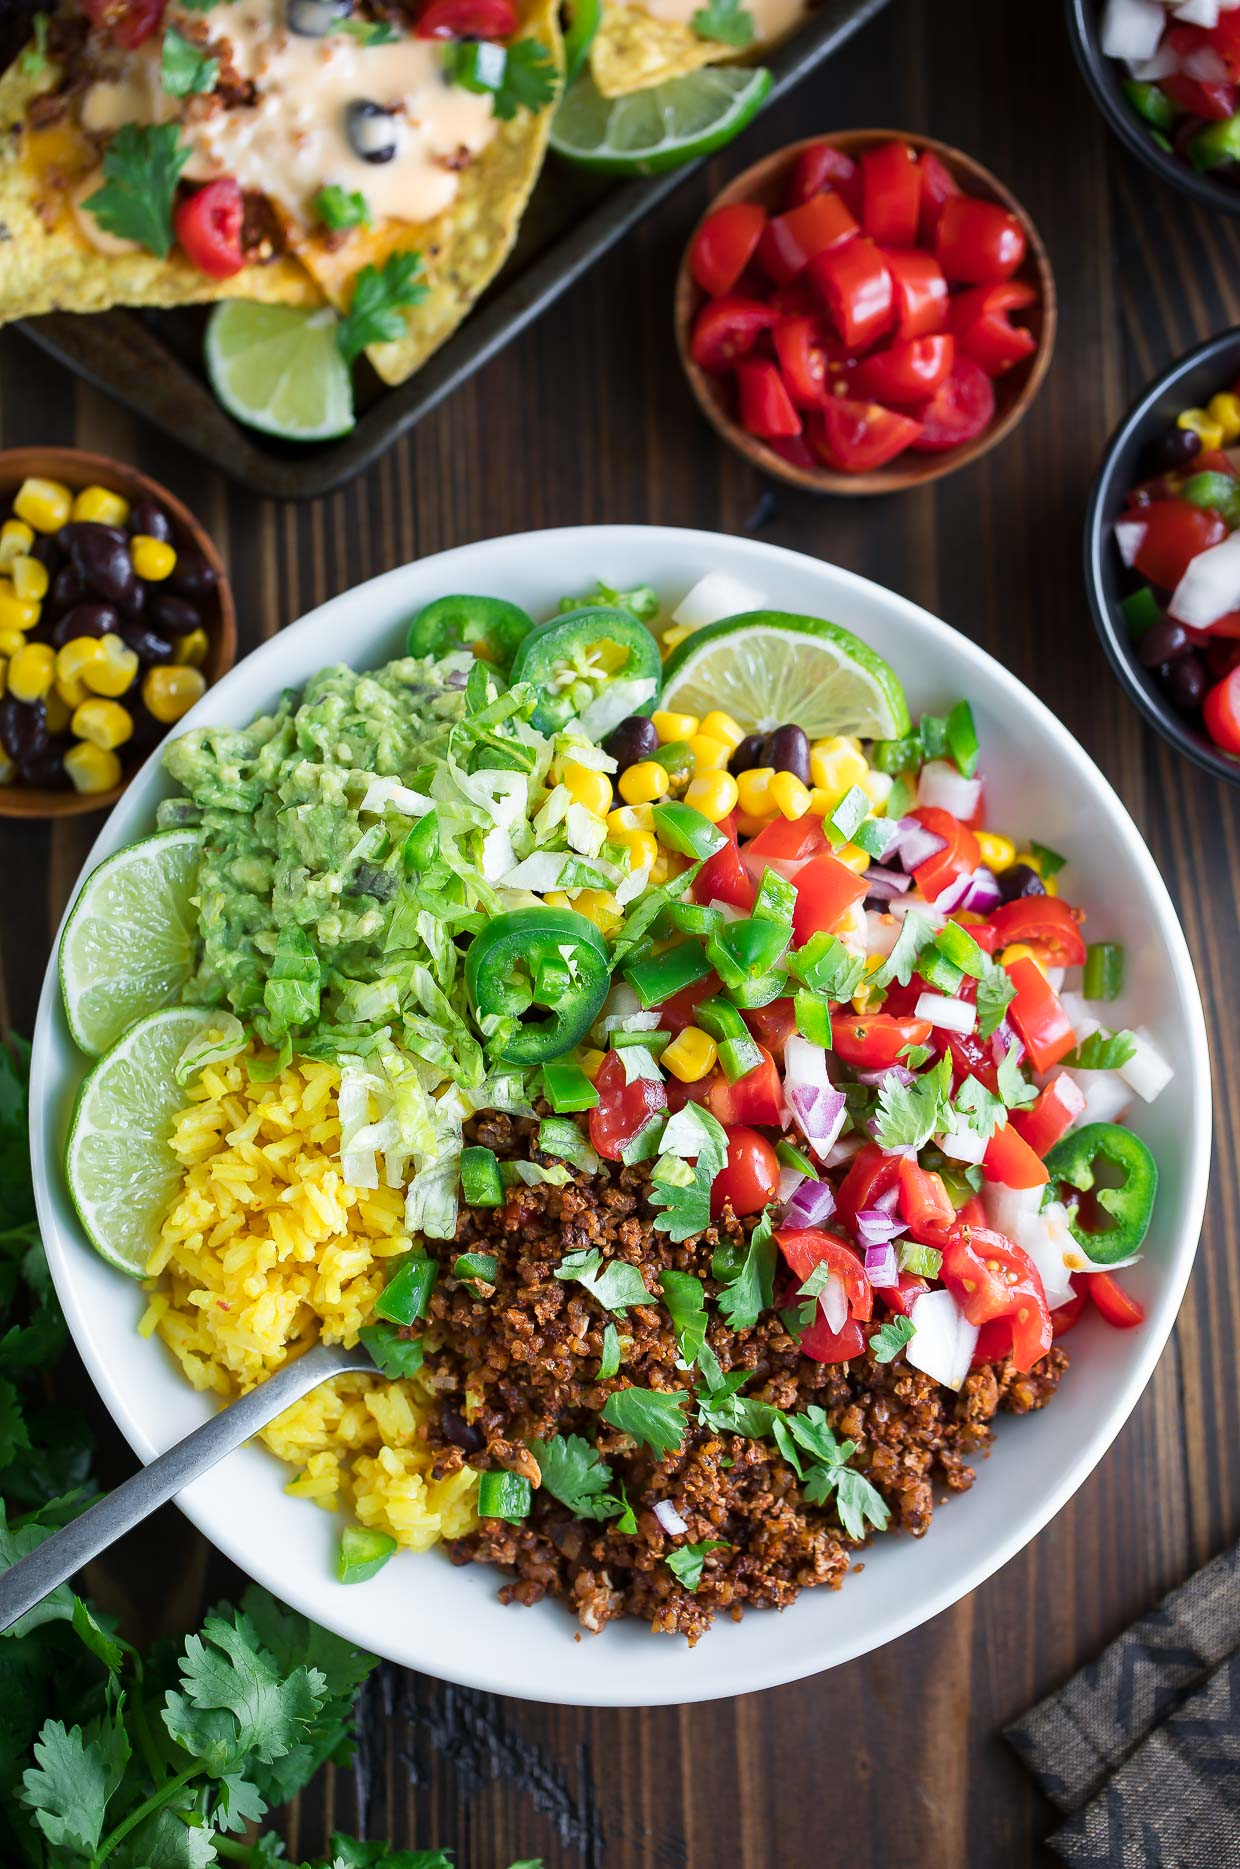 Weekly meal plan ideas: Vegetarian taco bowls at Peas and Crayons